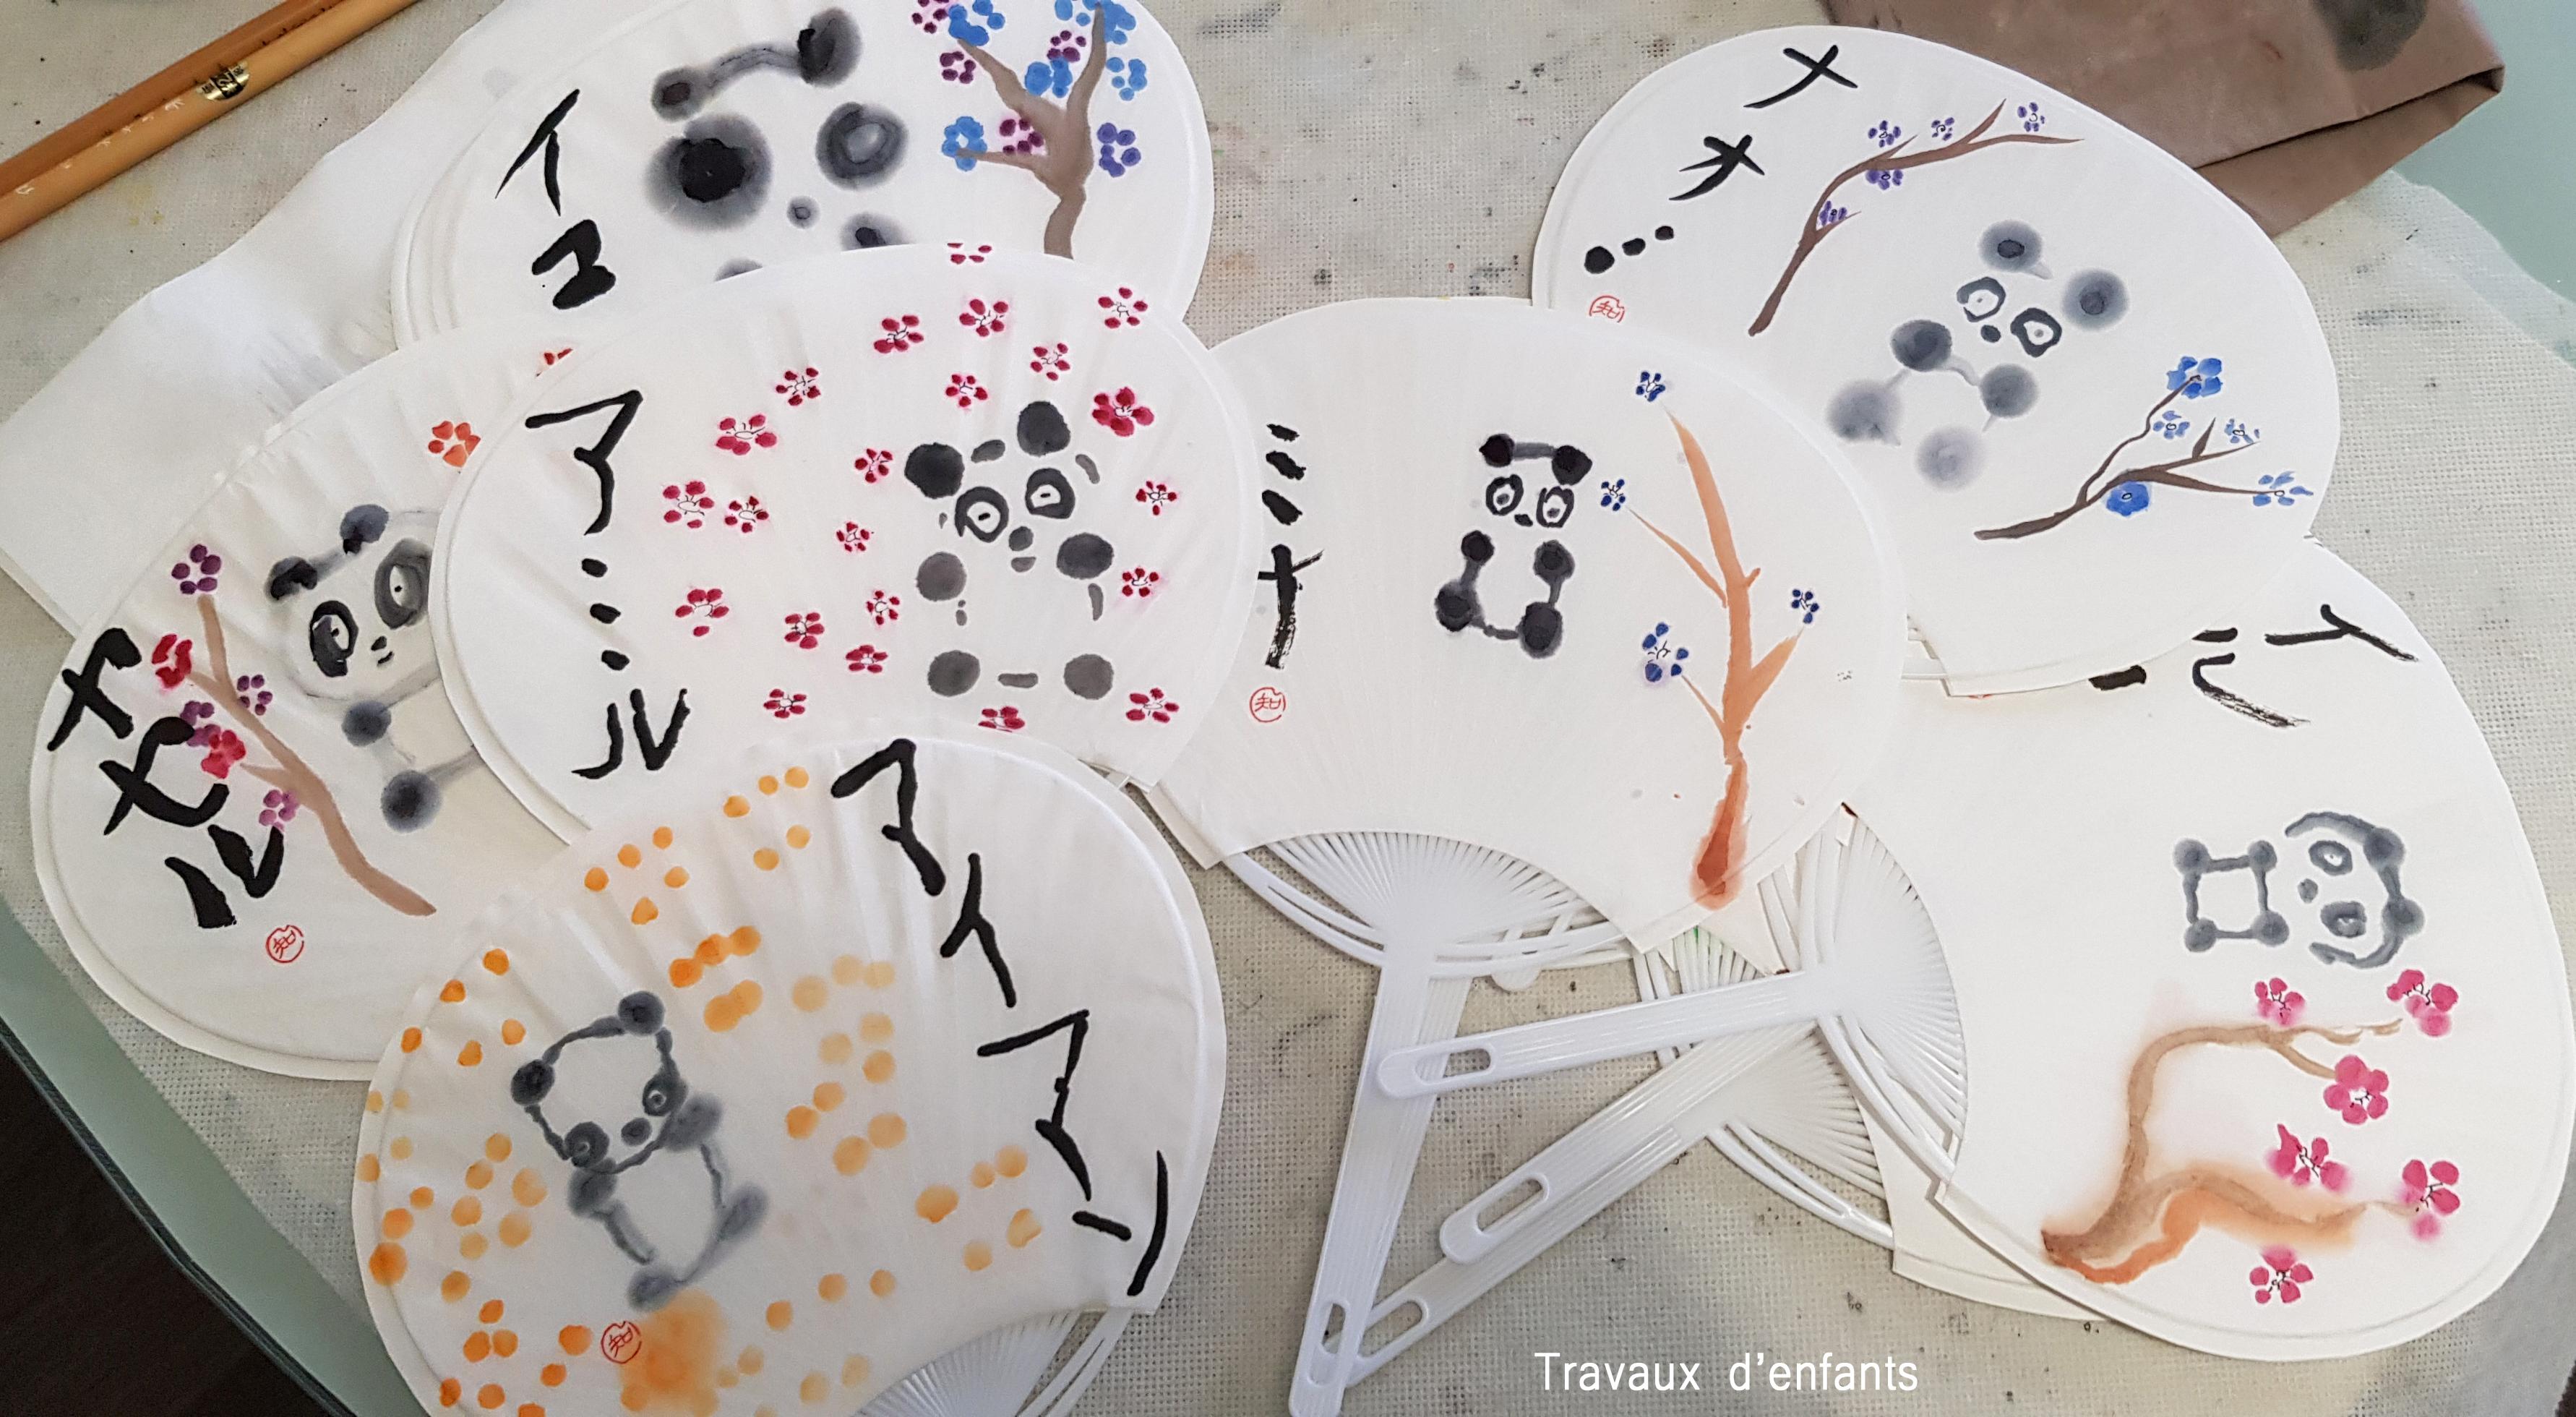 2020-03-06_Uchiwa d'enfants